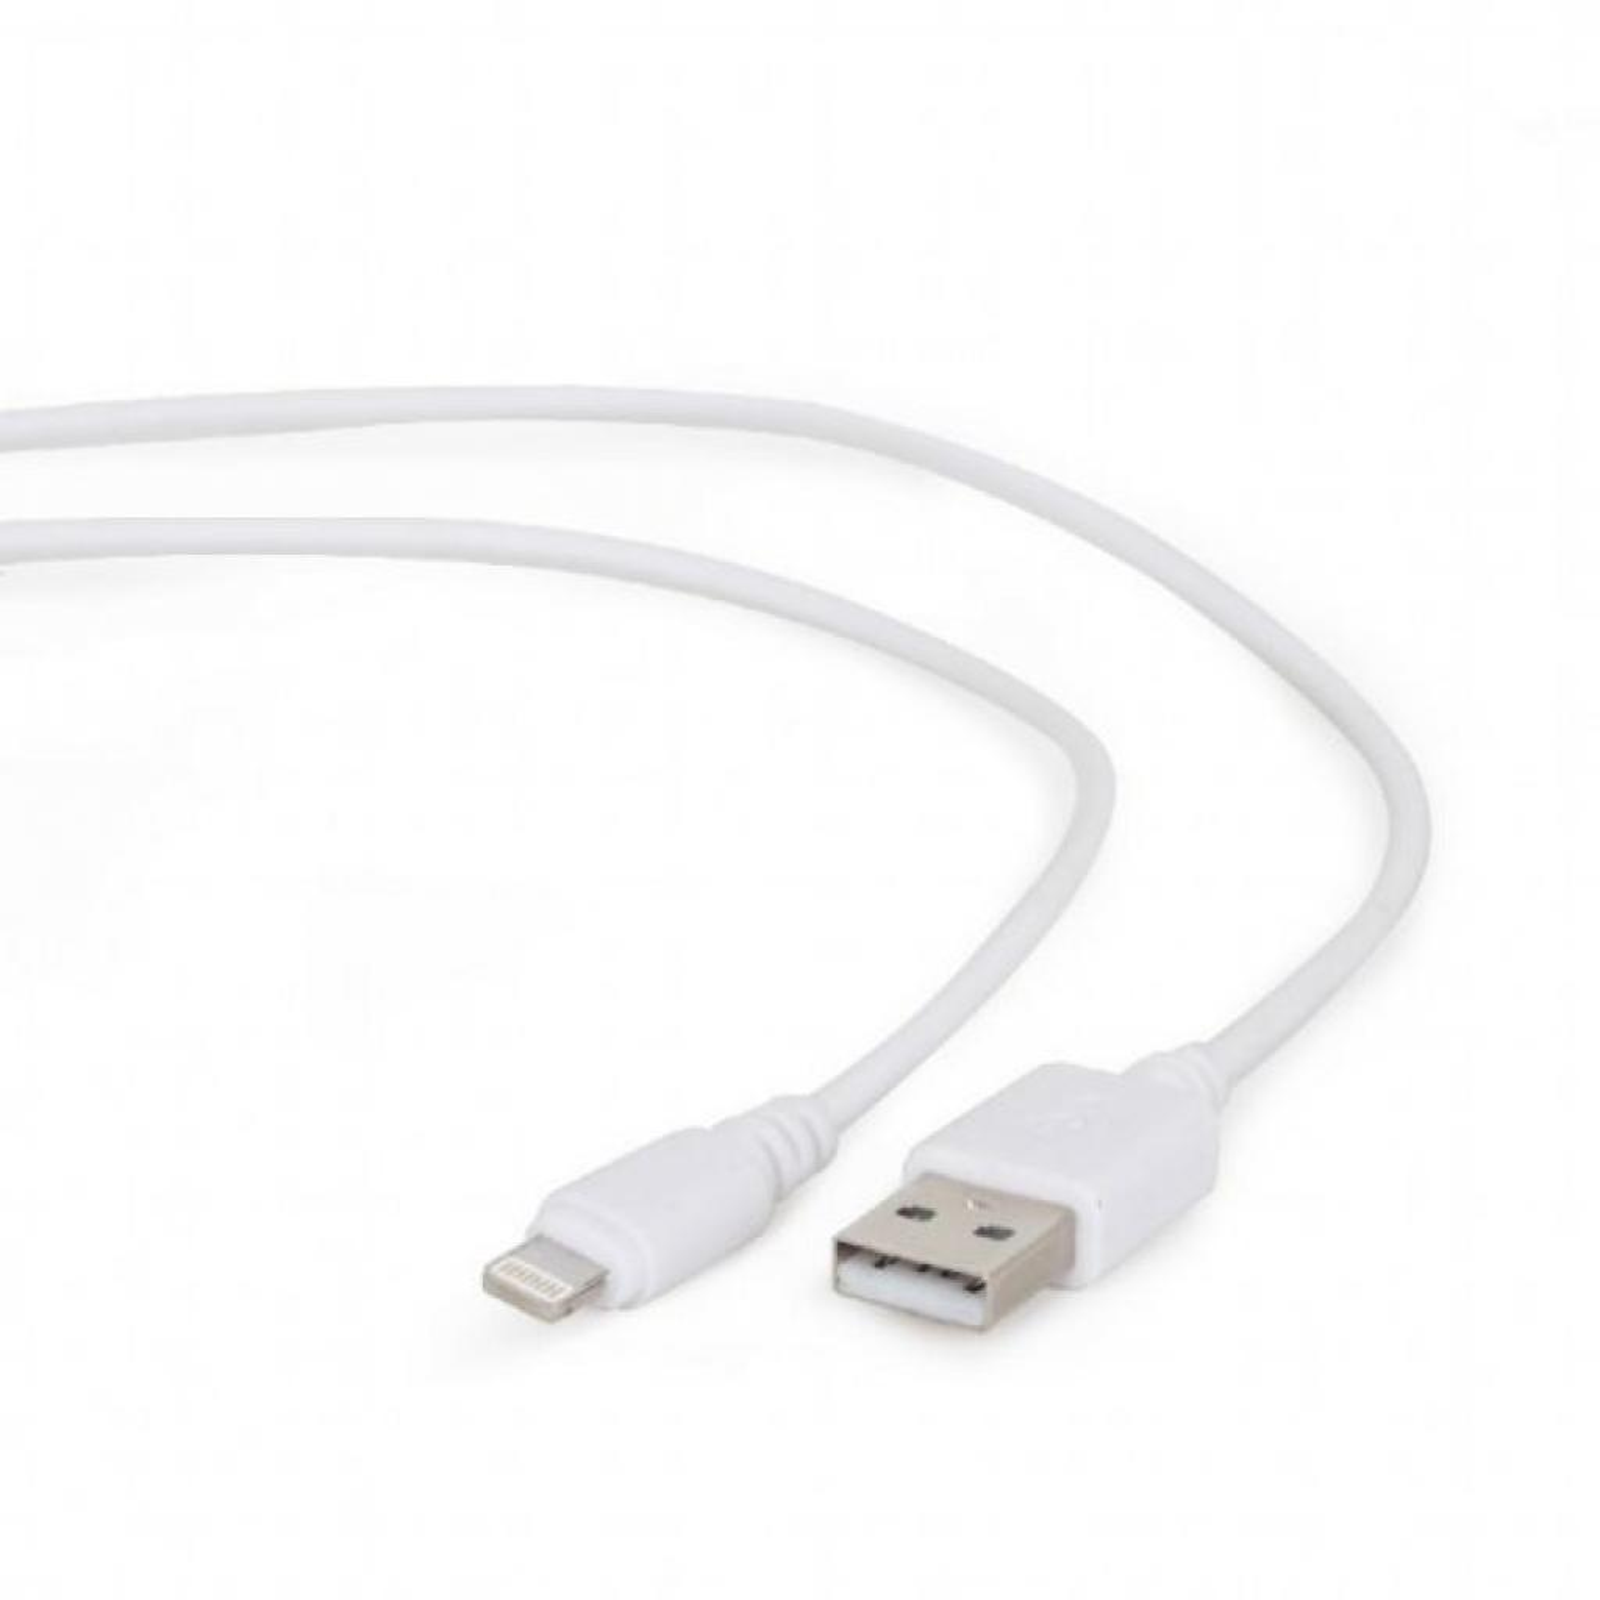 Дата кабель USB 2.0 AM to Lightning 0.5m Cablexpert (CC-USB2-AMLM-W-0.5M)